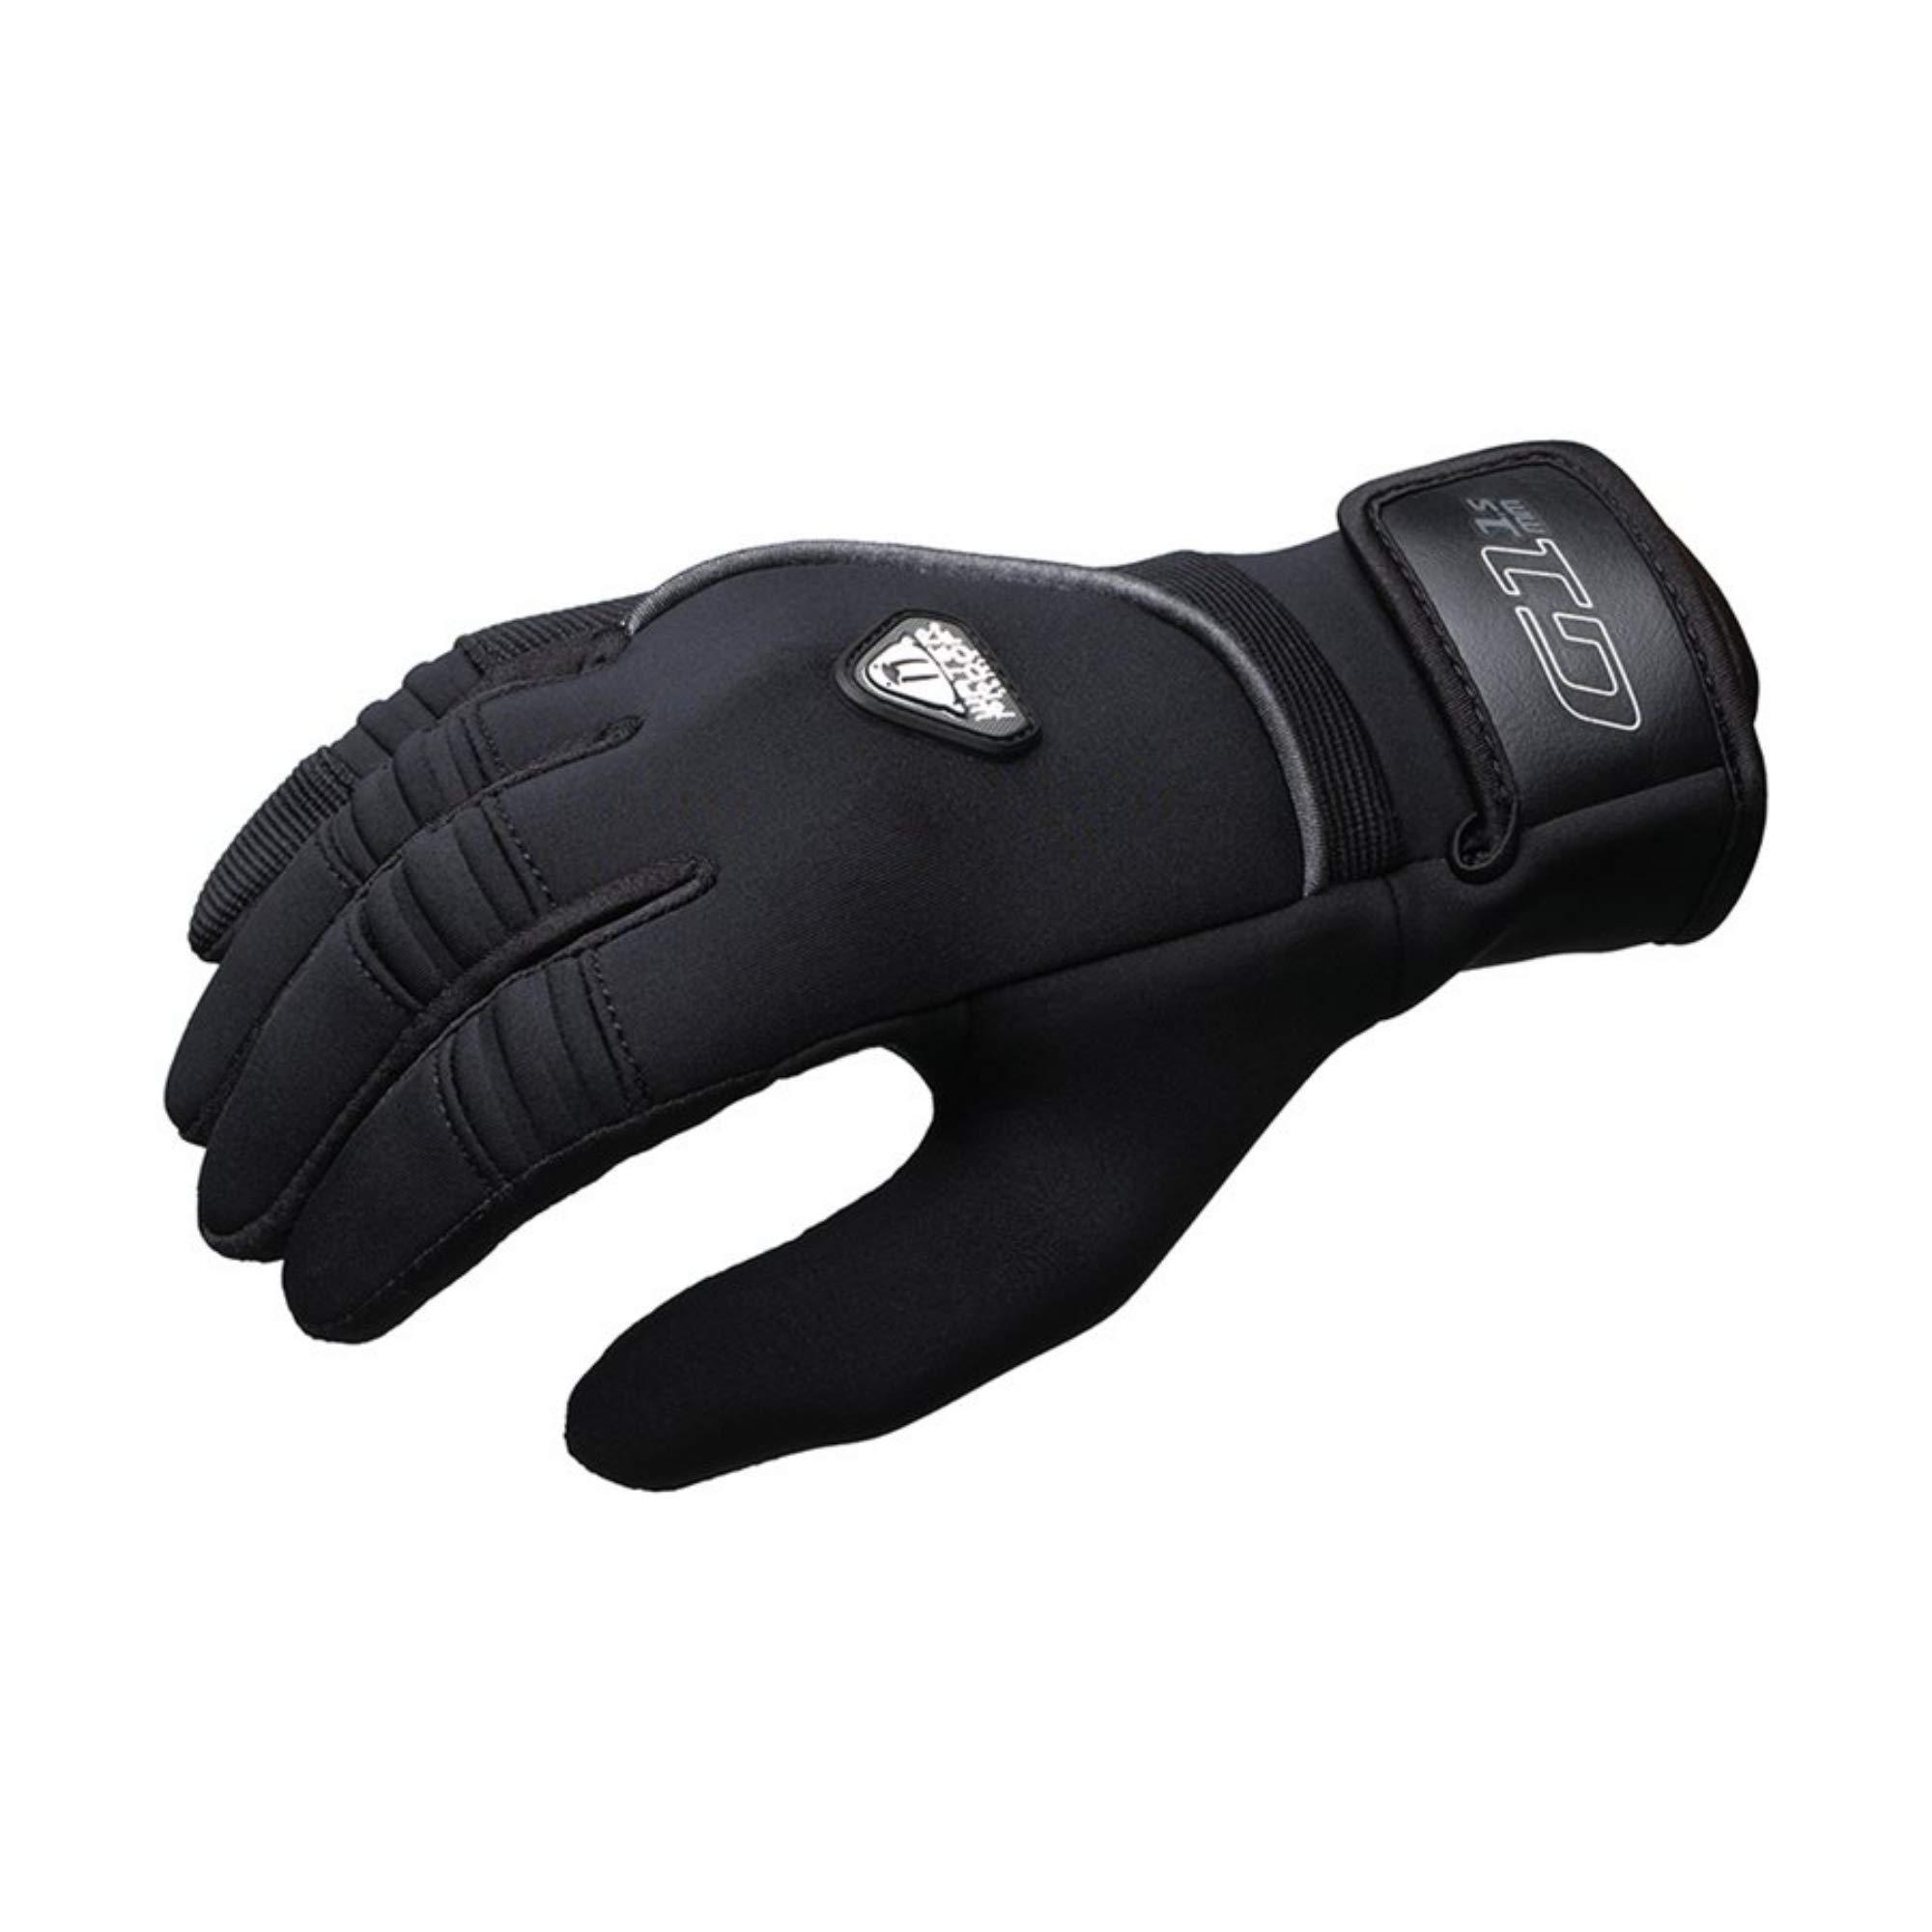 Waterproof G1 1.5mm Tropic Gloves, Small by Waterproof